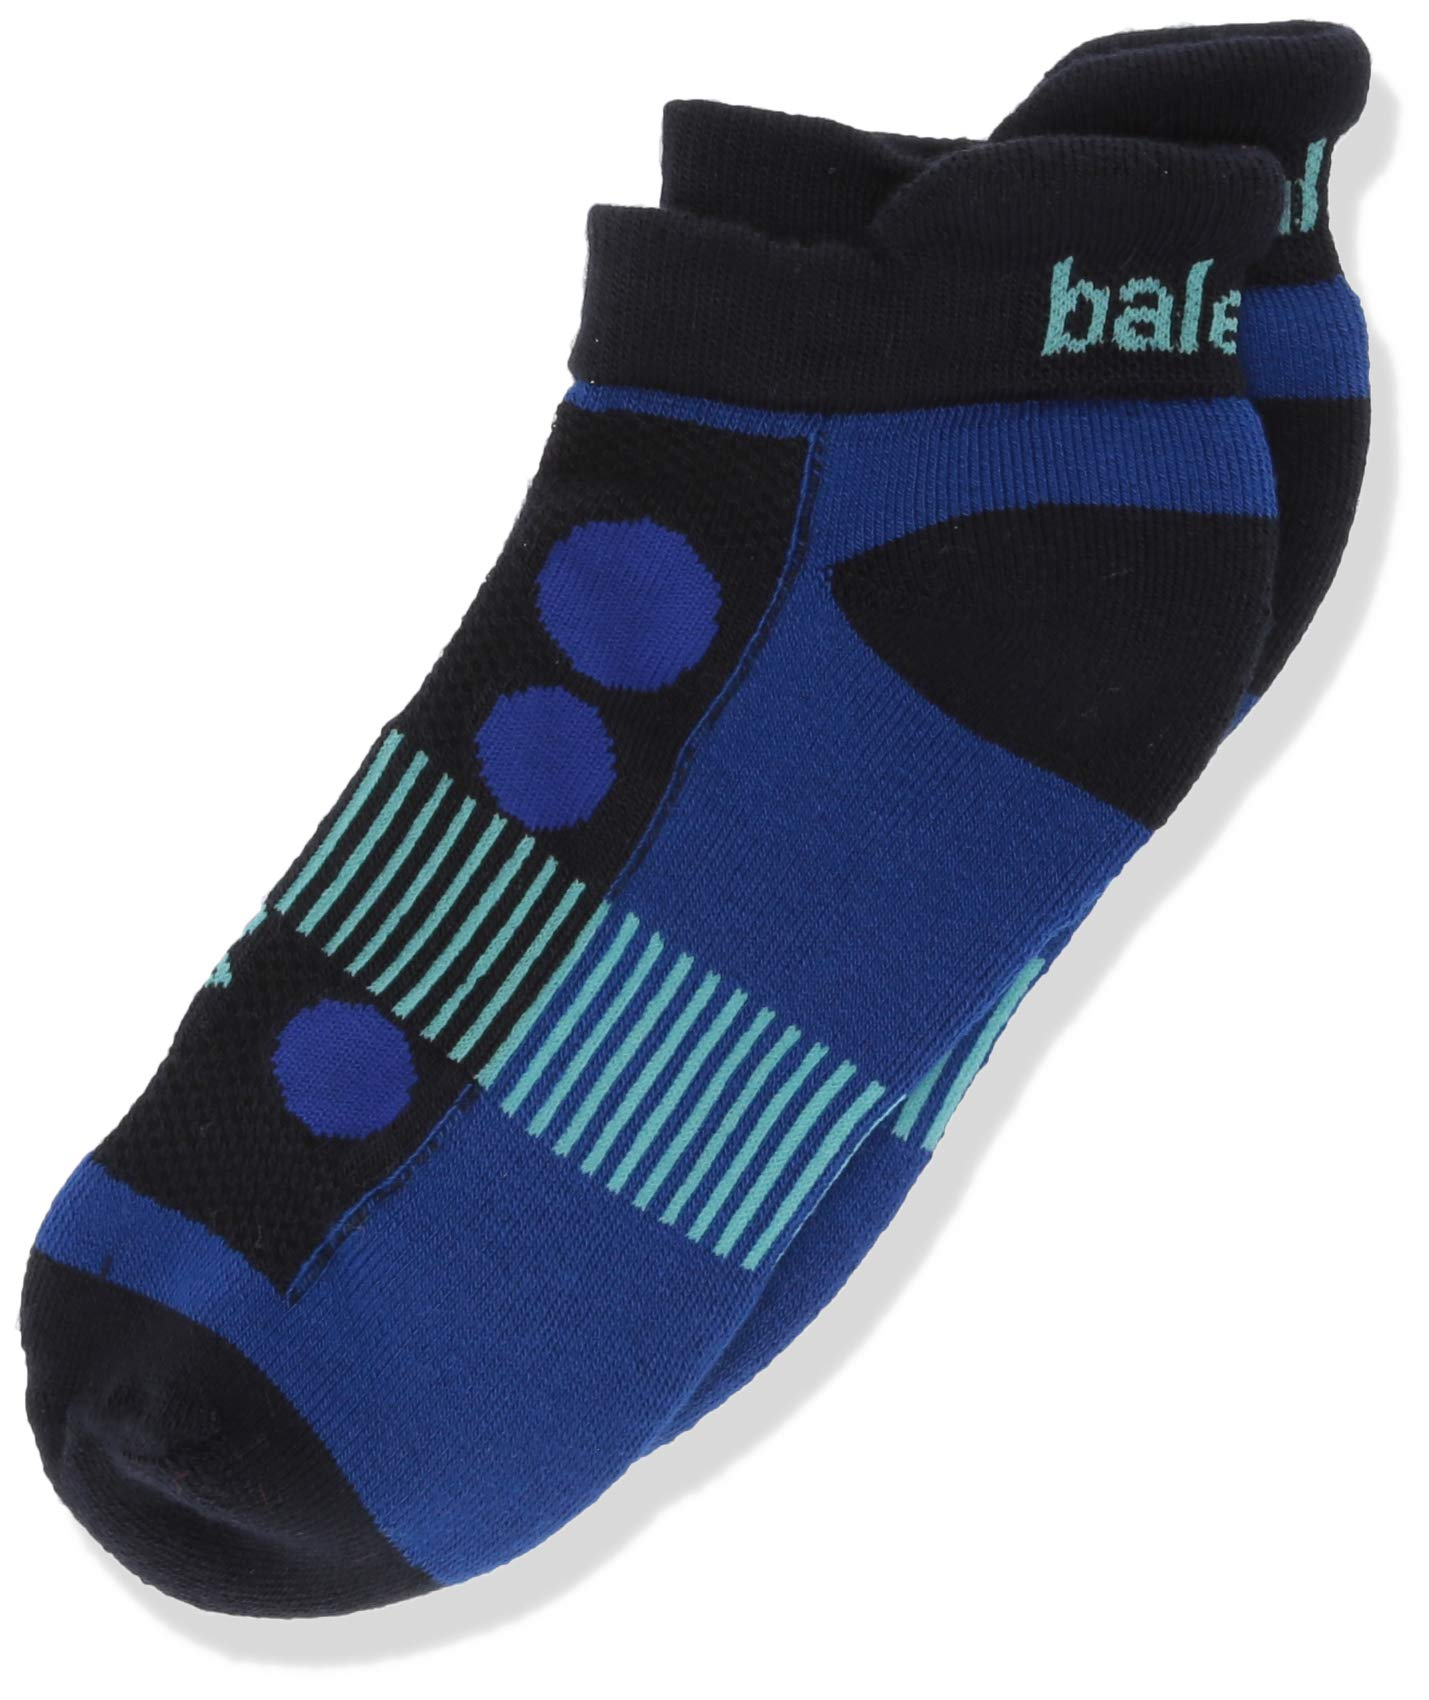 Balega Kids Hidden Cool Socks (1 Pair), Navy/Cobalt, X-Large by Balega